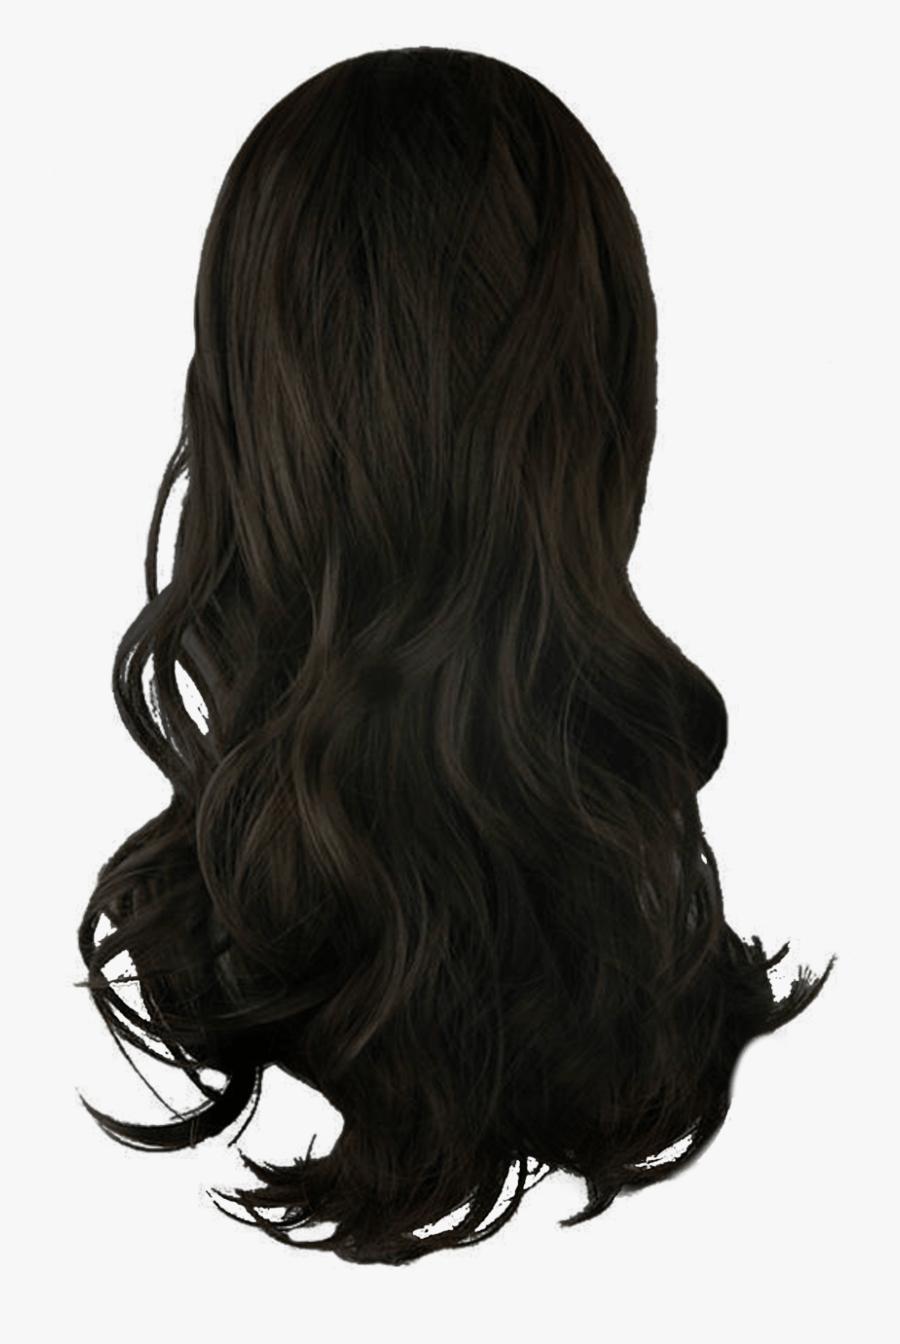 Curly Hair Clipart